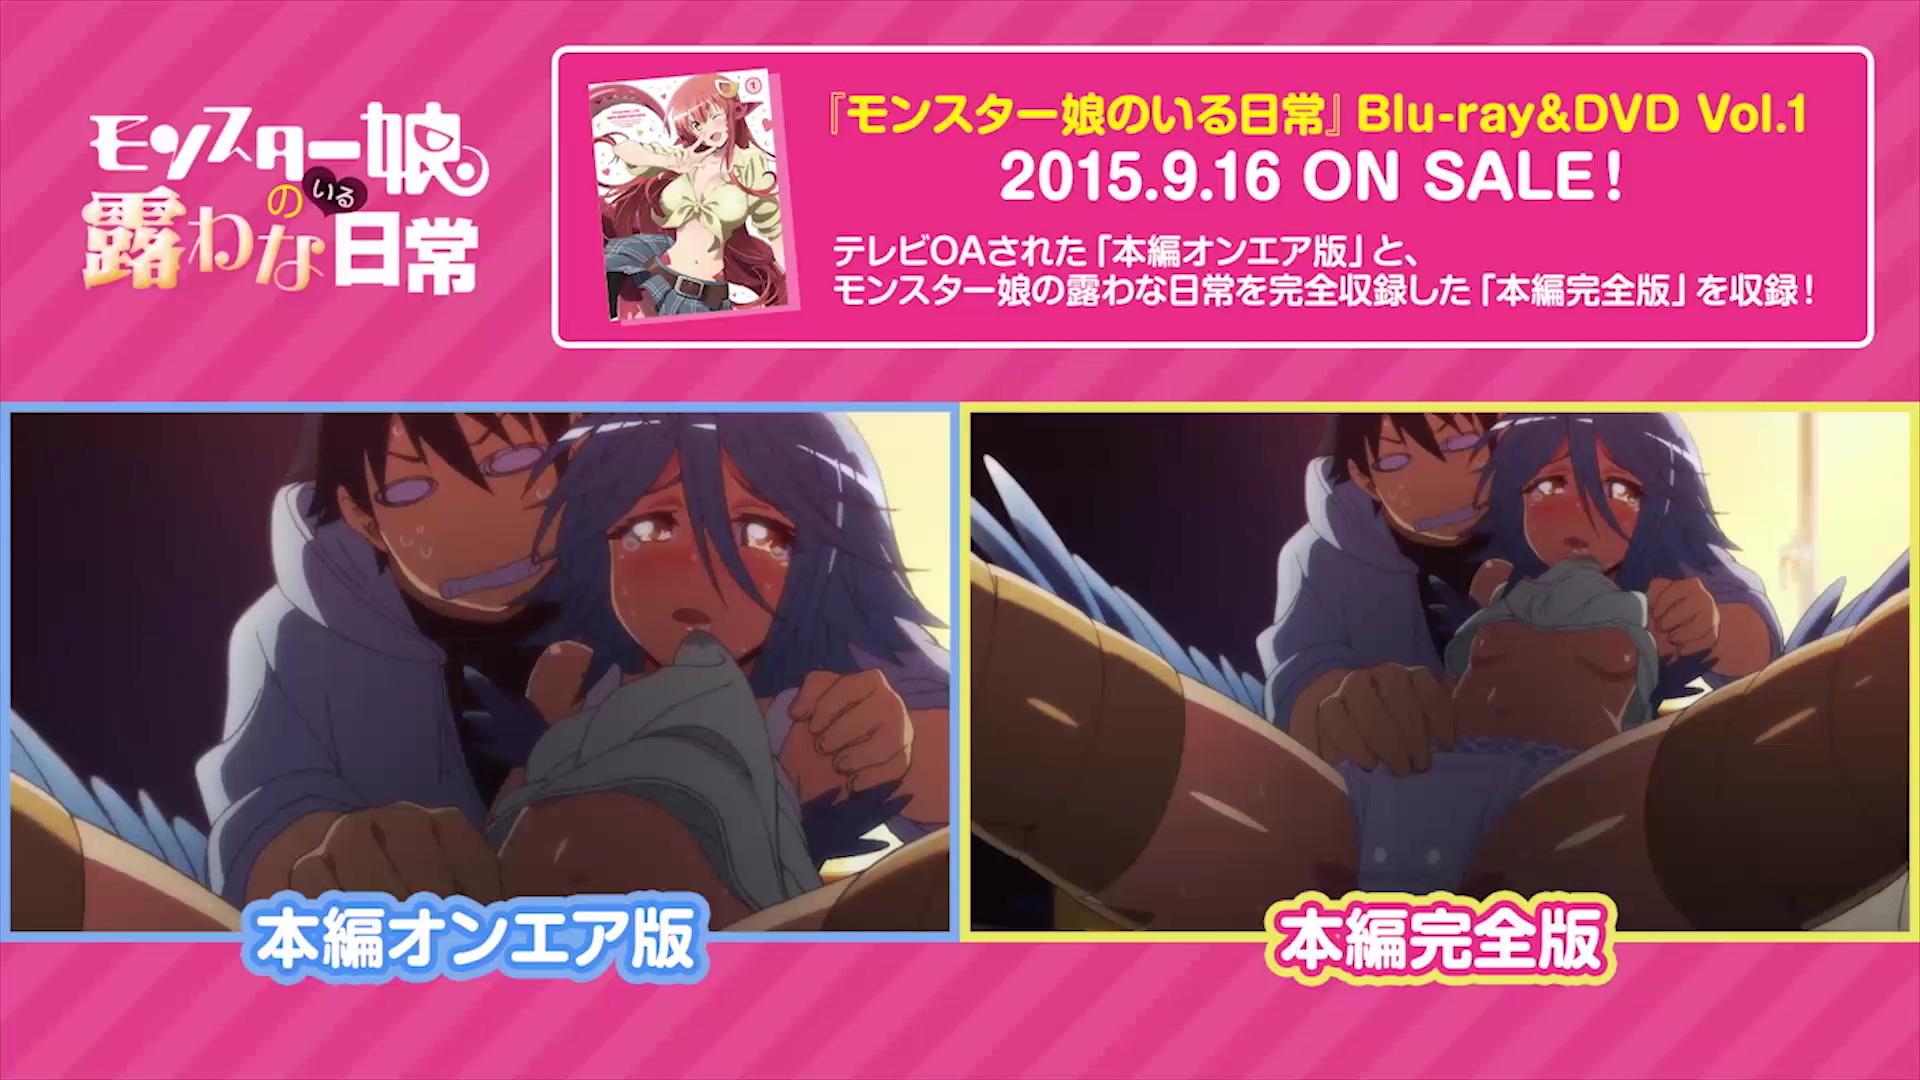 TV vs Blu-Ray Monster Musume anime blu-ray volume 1 uncensored 16